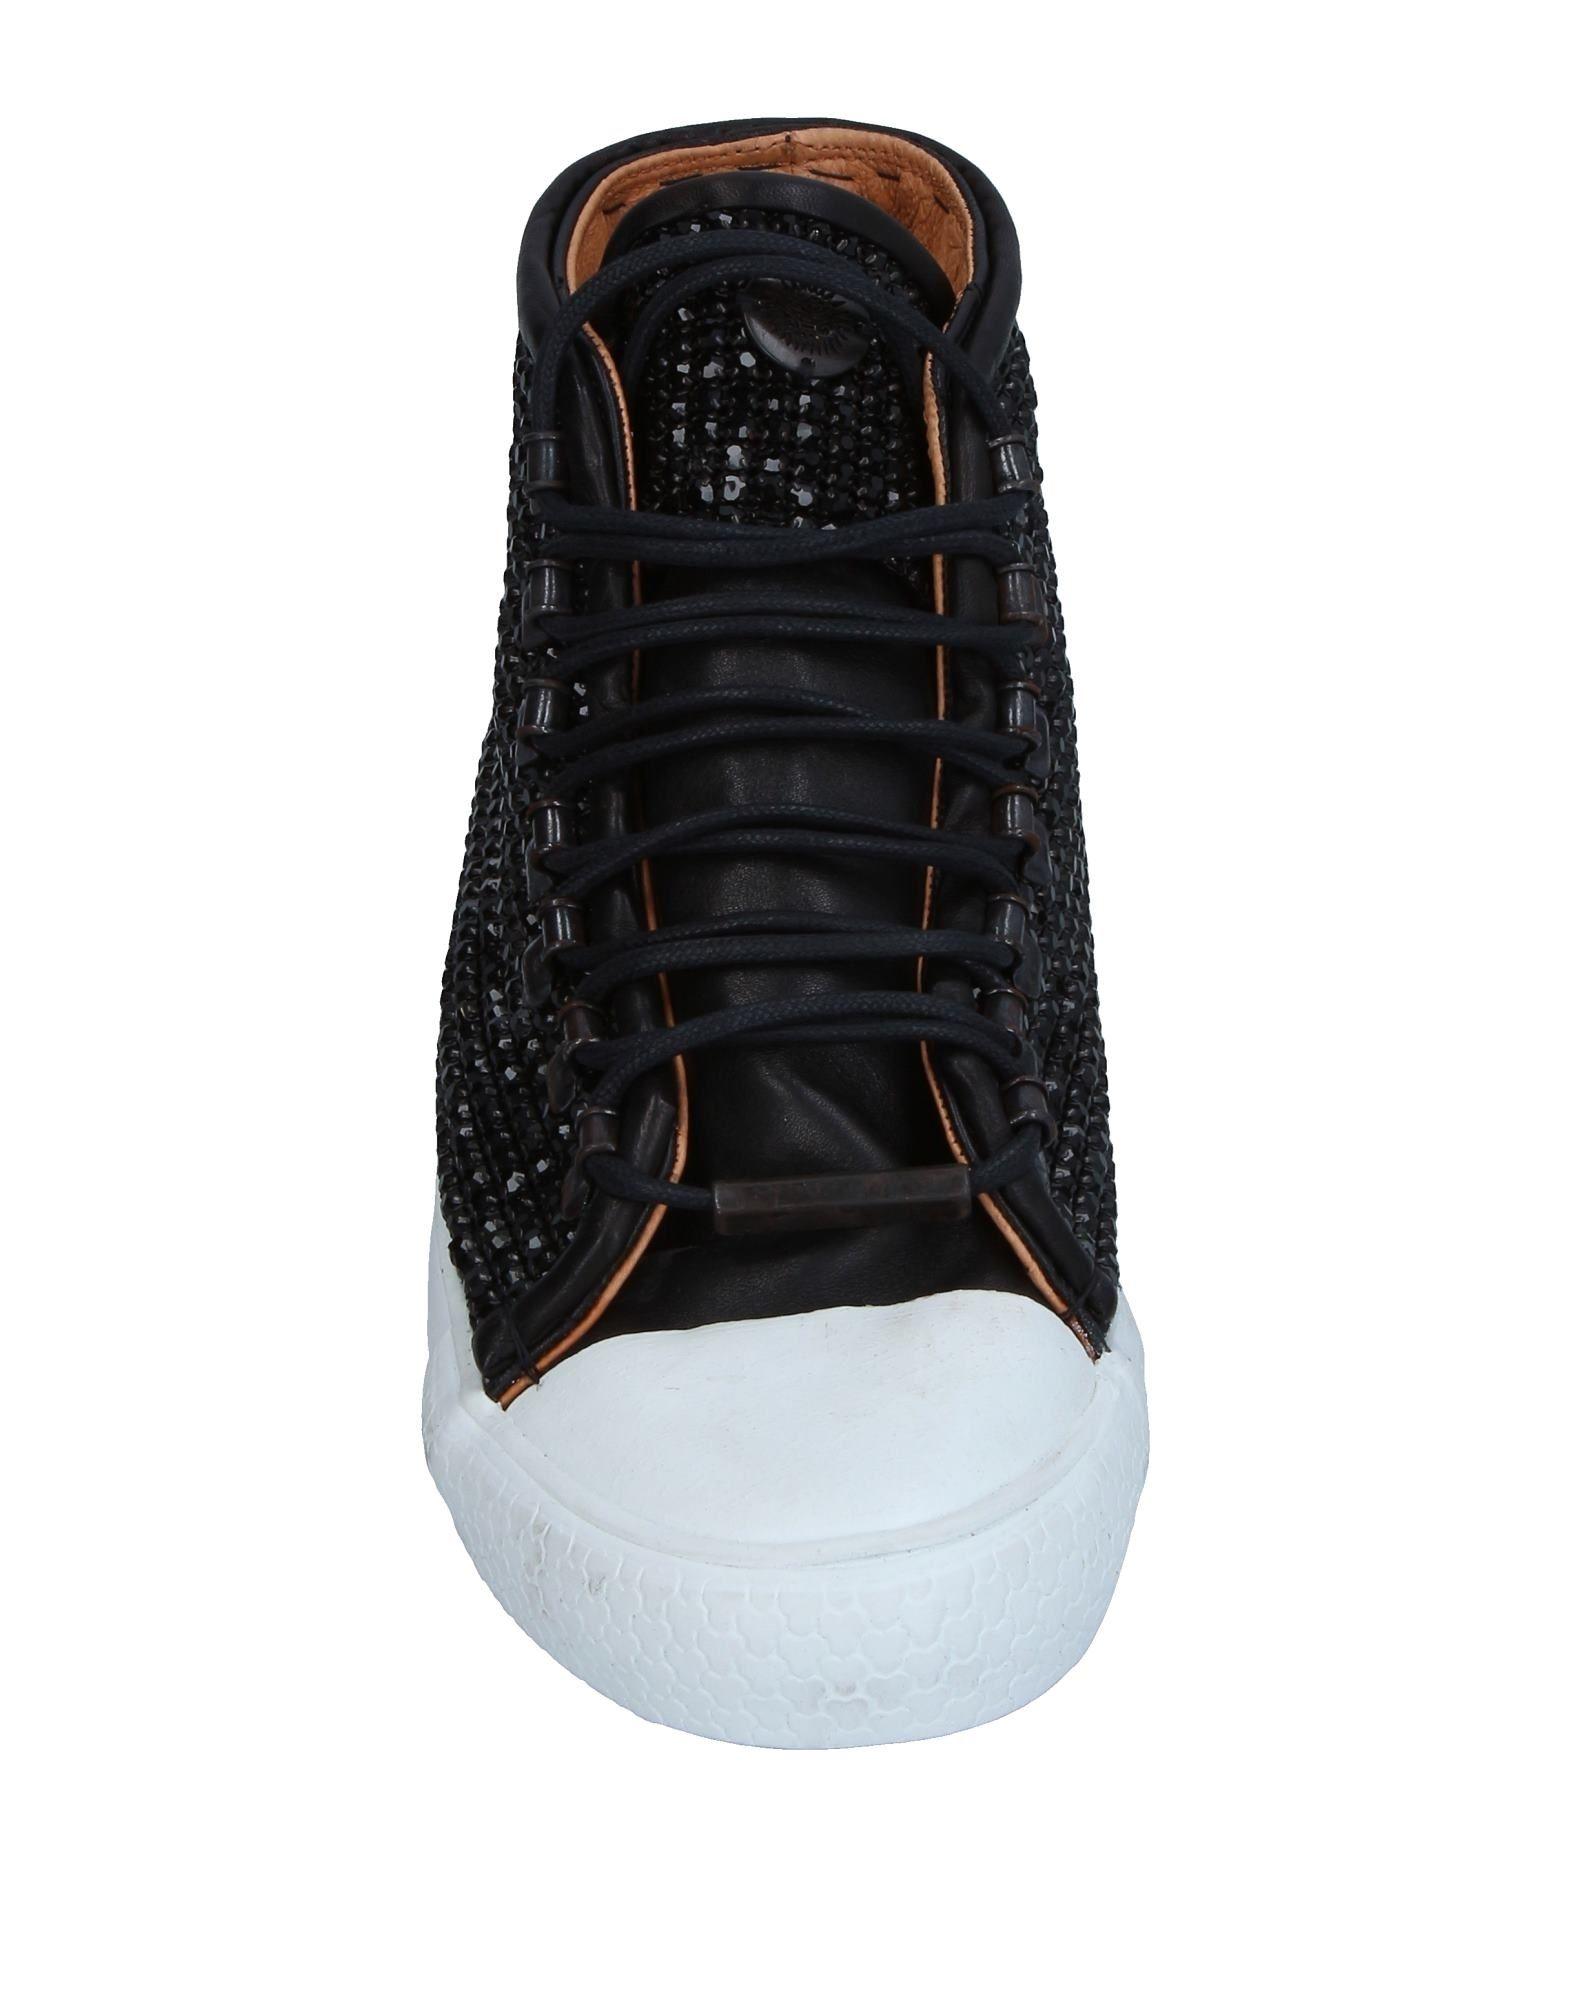 Black Dioniso Sneakers - Women Black Dioniso Sneakers Kingdom online on  United Kingdom Sneakers - 11310285KN e858ae